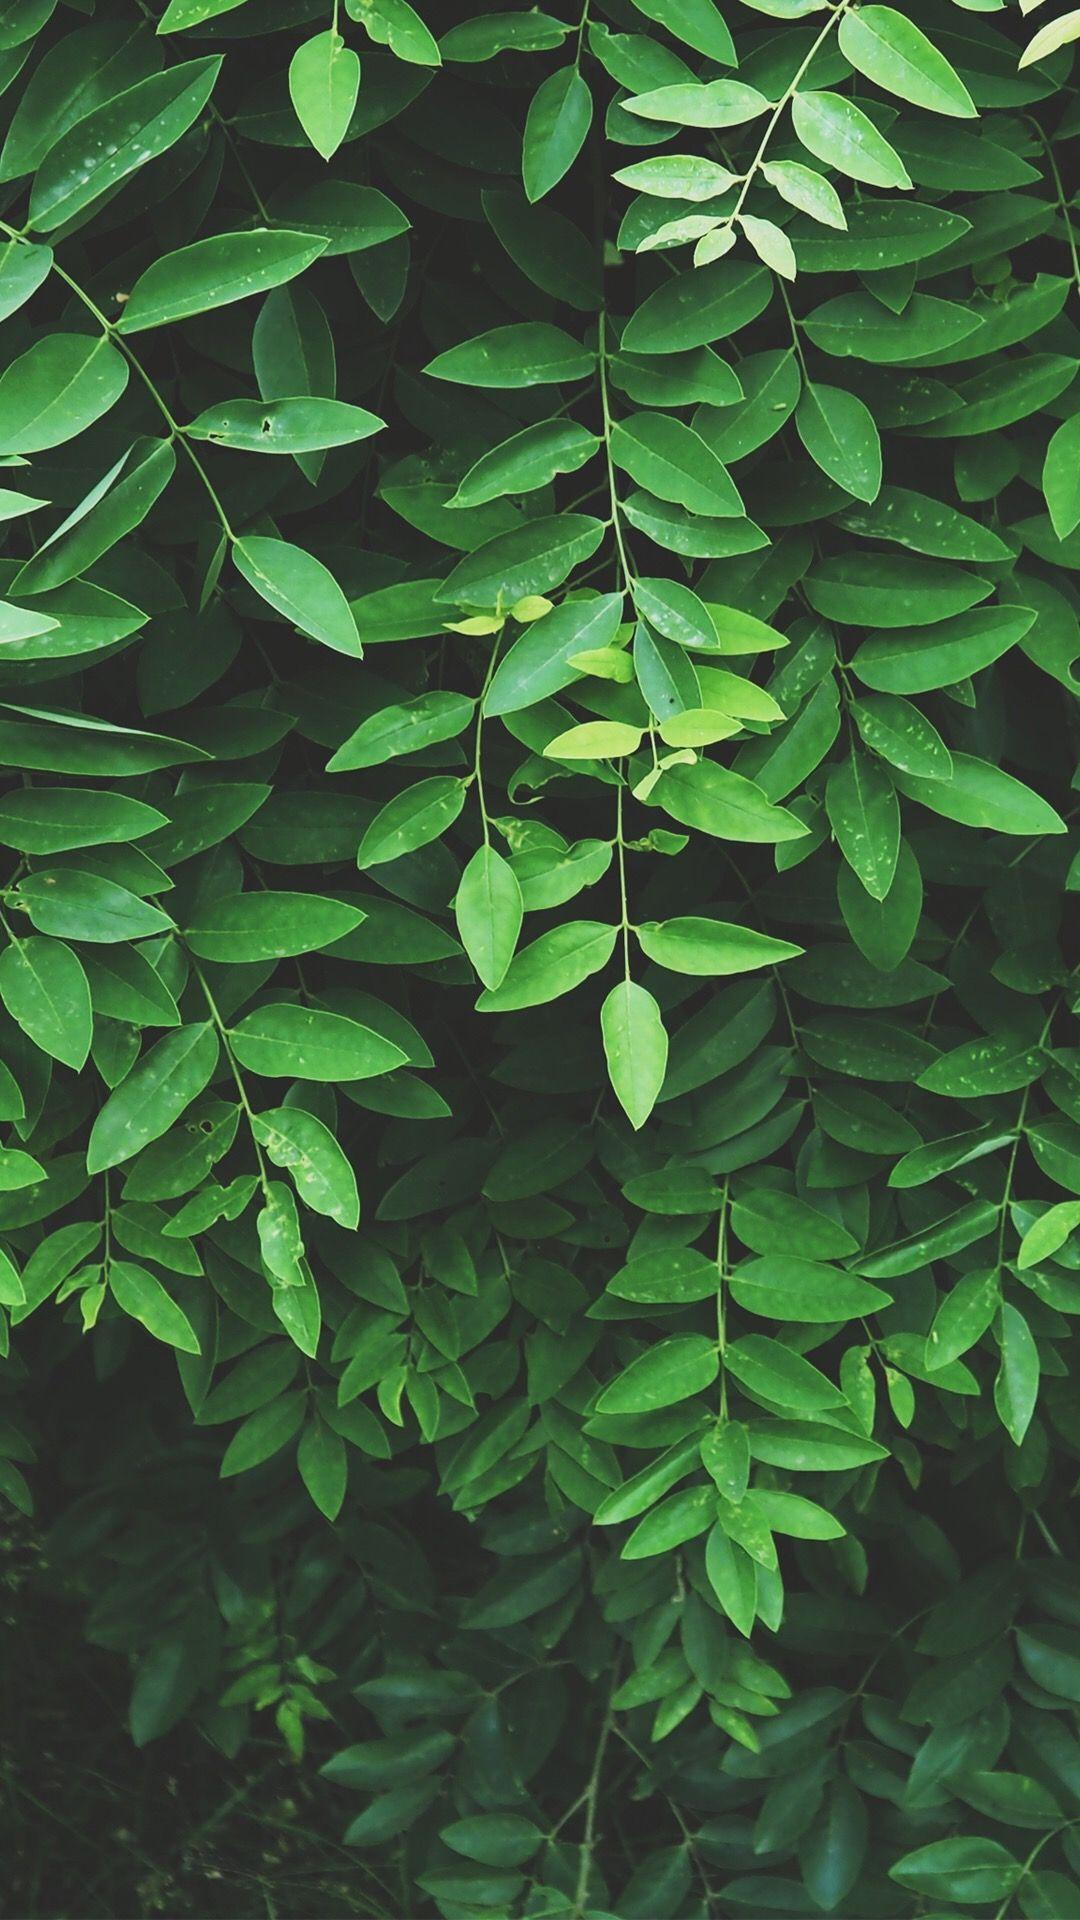 16+ Green Aesthetics Wallpapers on WallpaperSafari